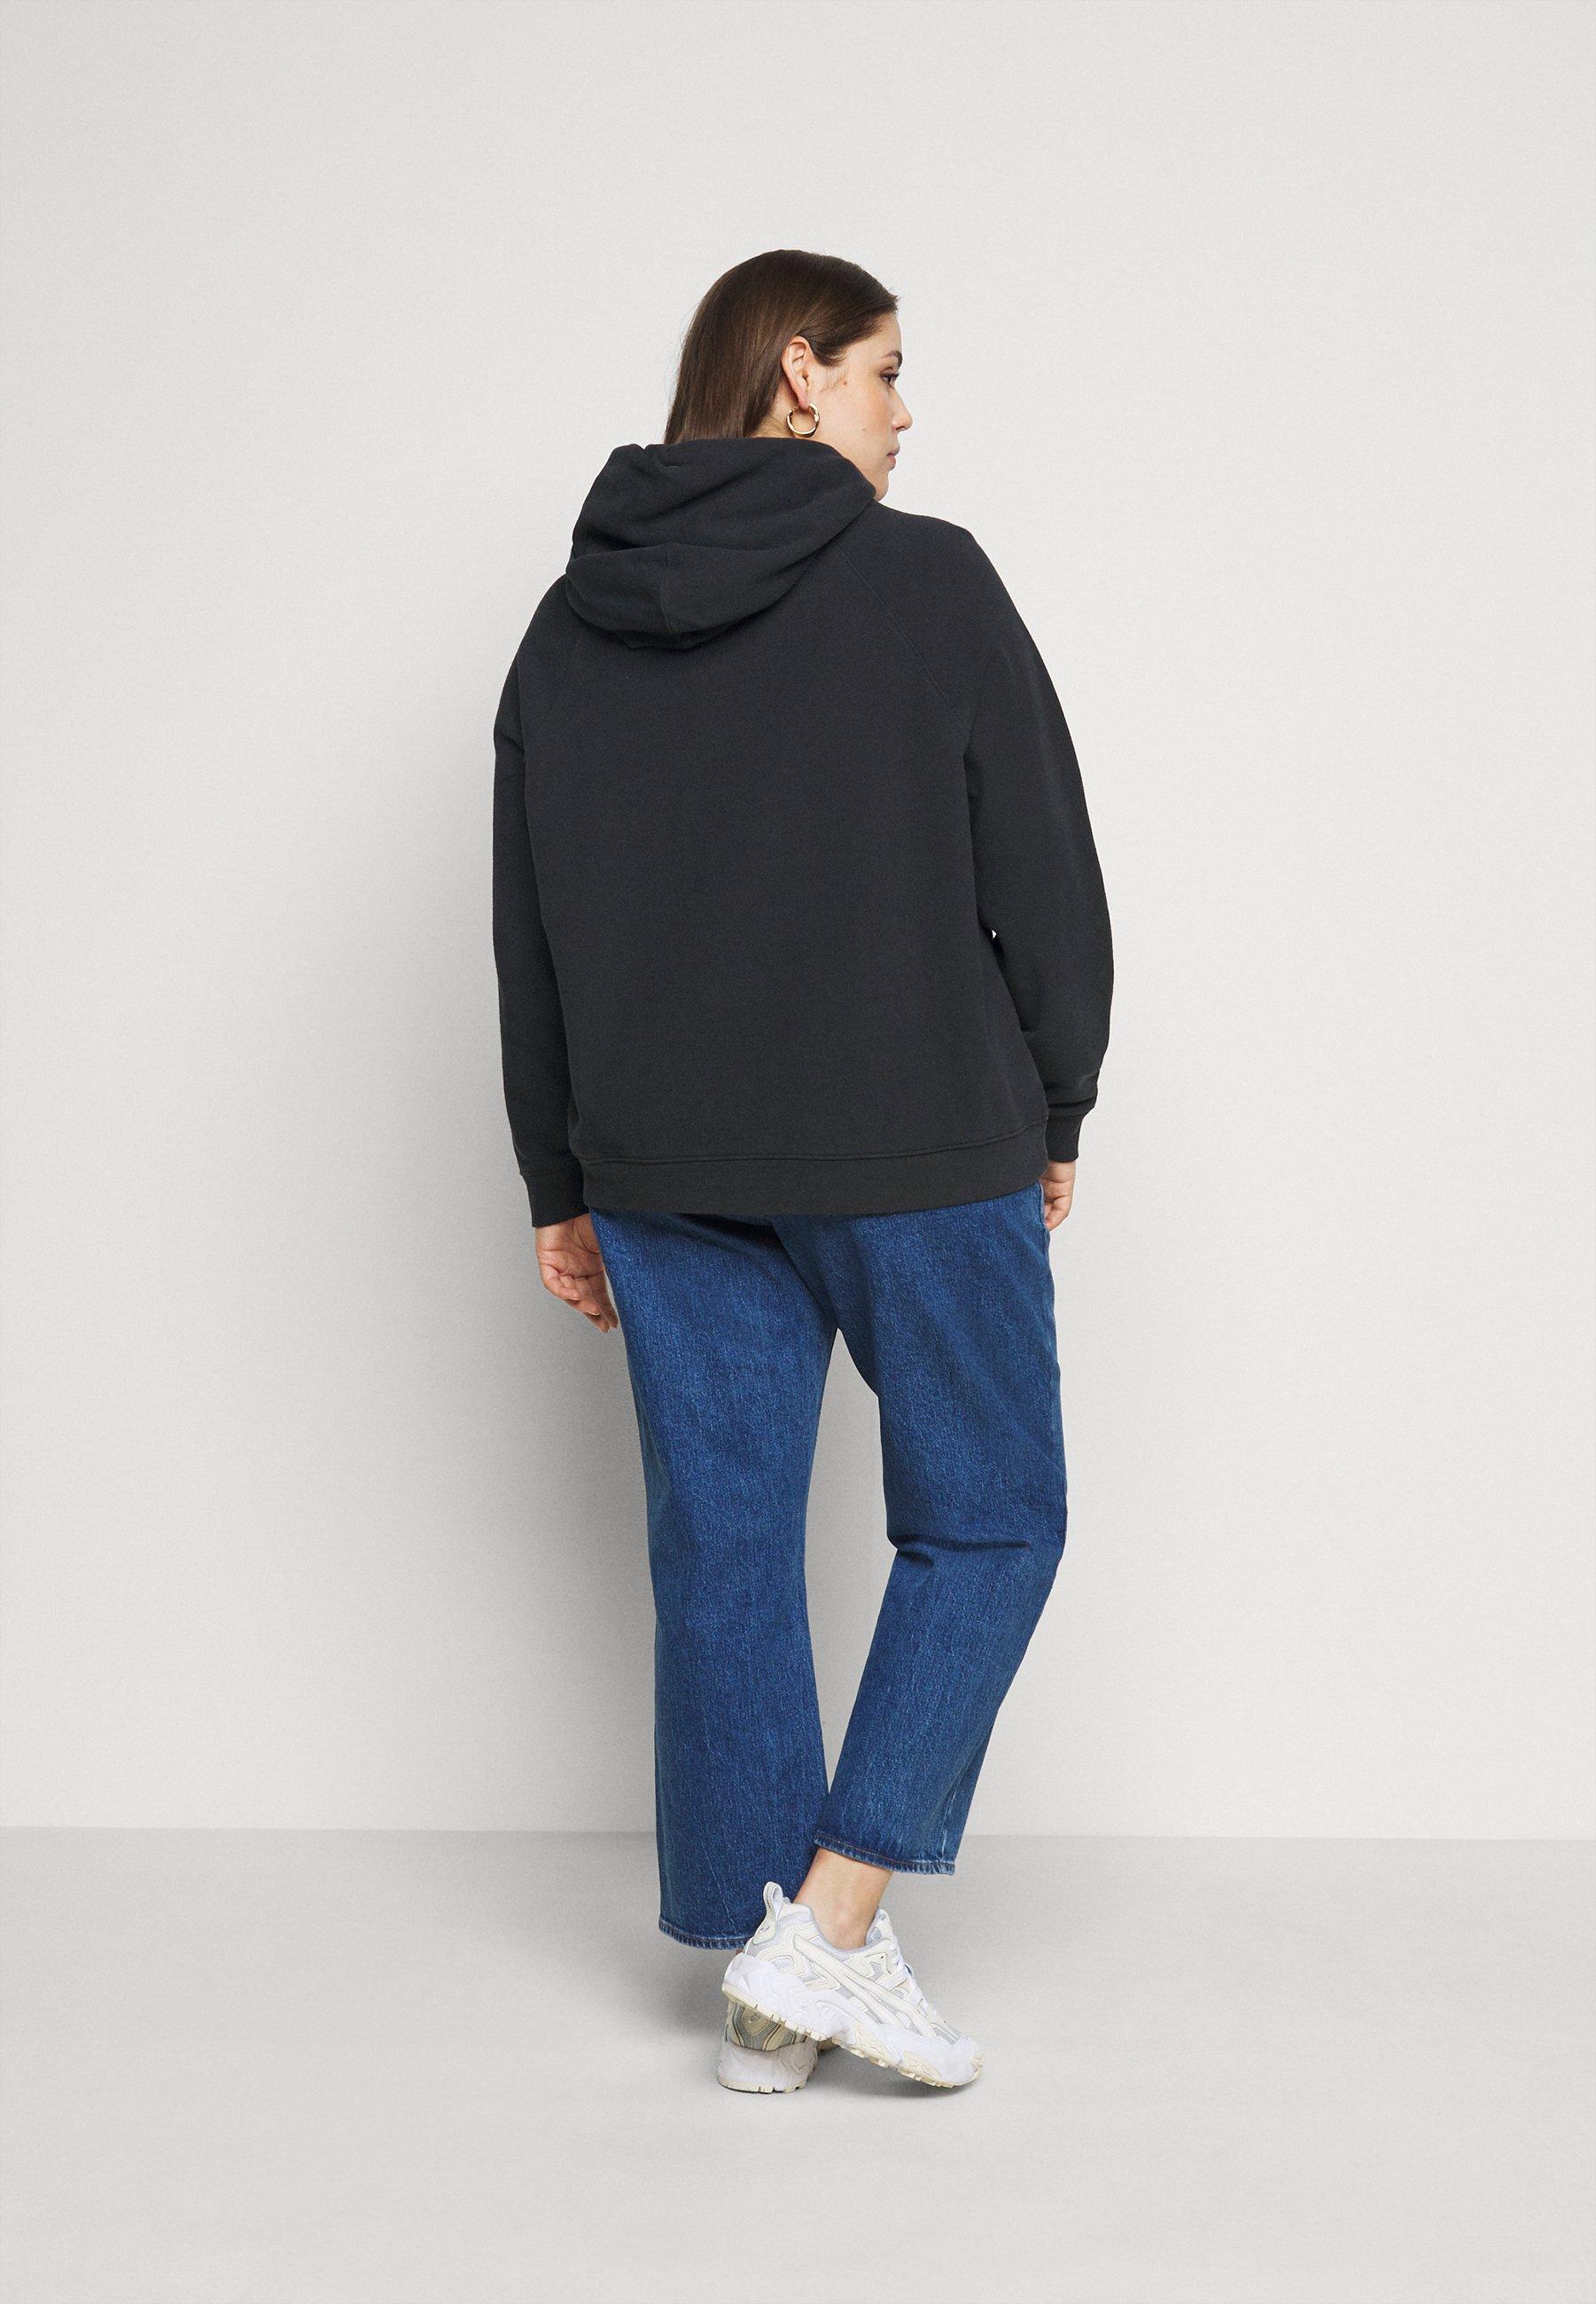 Levi's® Plus NONGRAPHIC SPORT HOOD - Hoodie - caviar - Women's winter clothes CwhkI